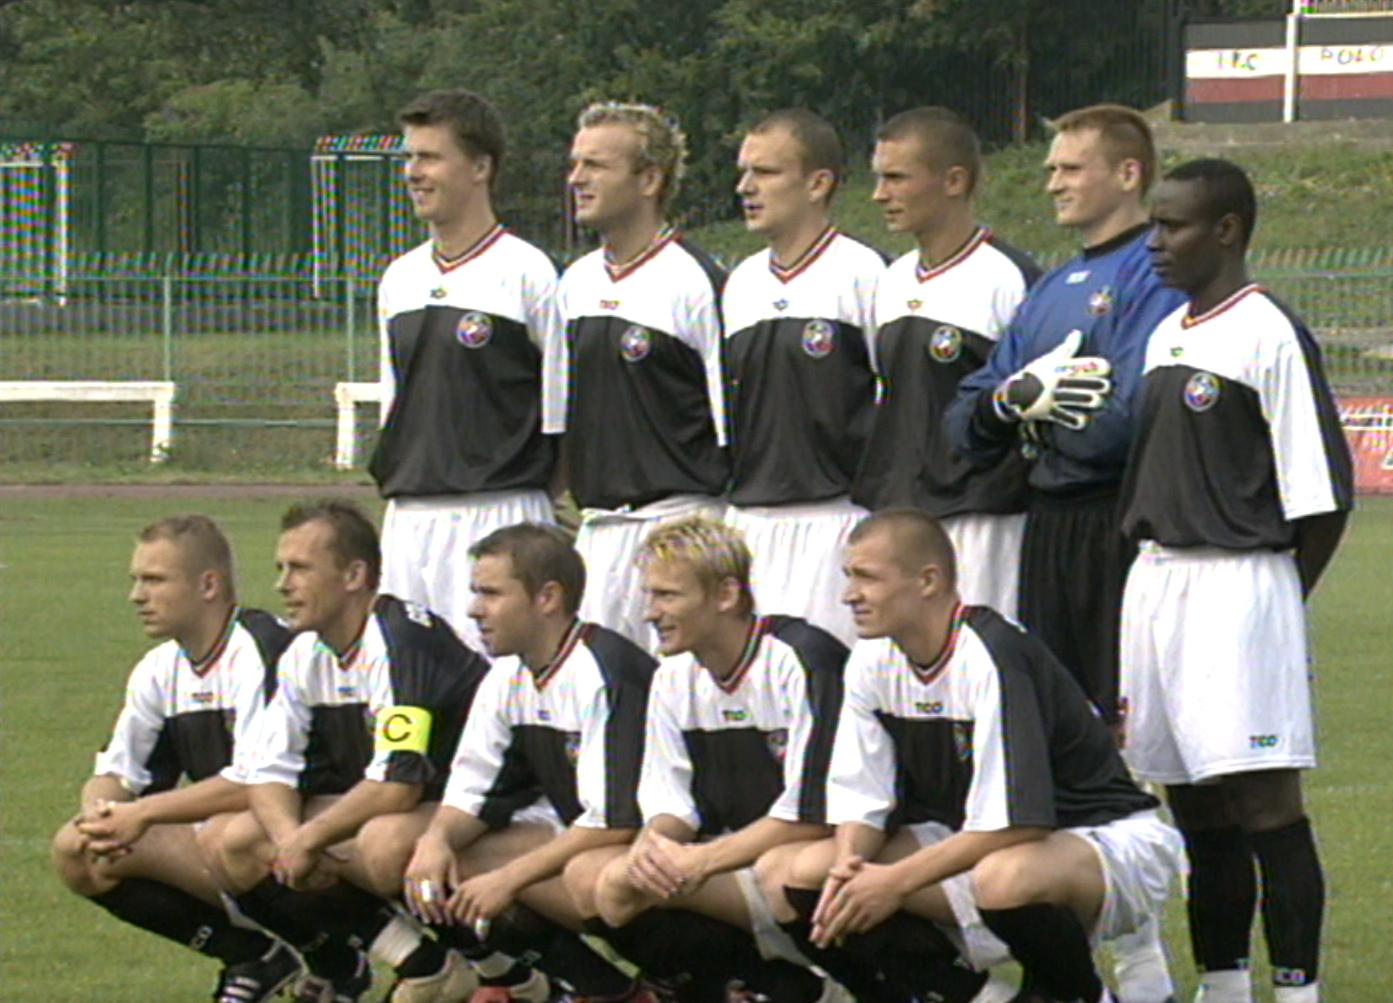 Polonia Warszawa - Sliema Wanderers 2:0 (29.08.2002)